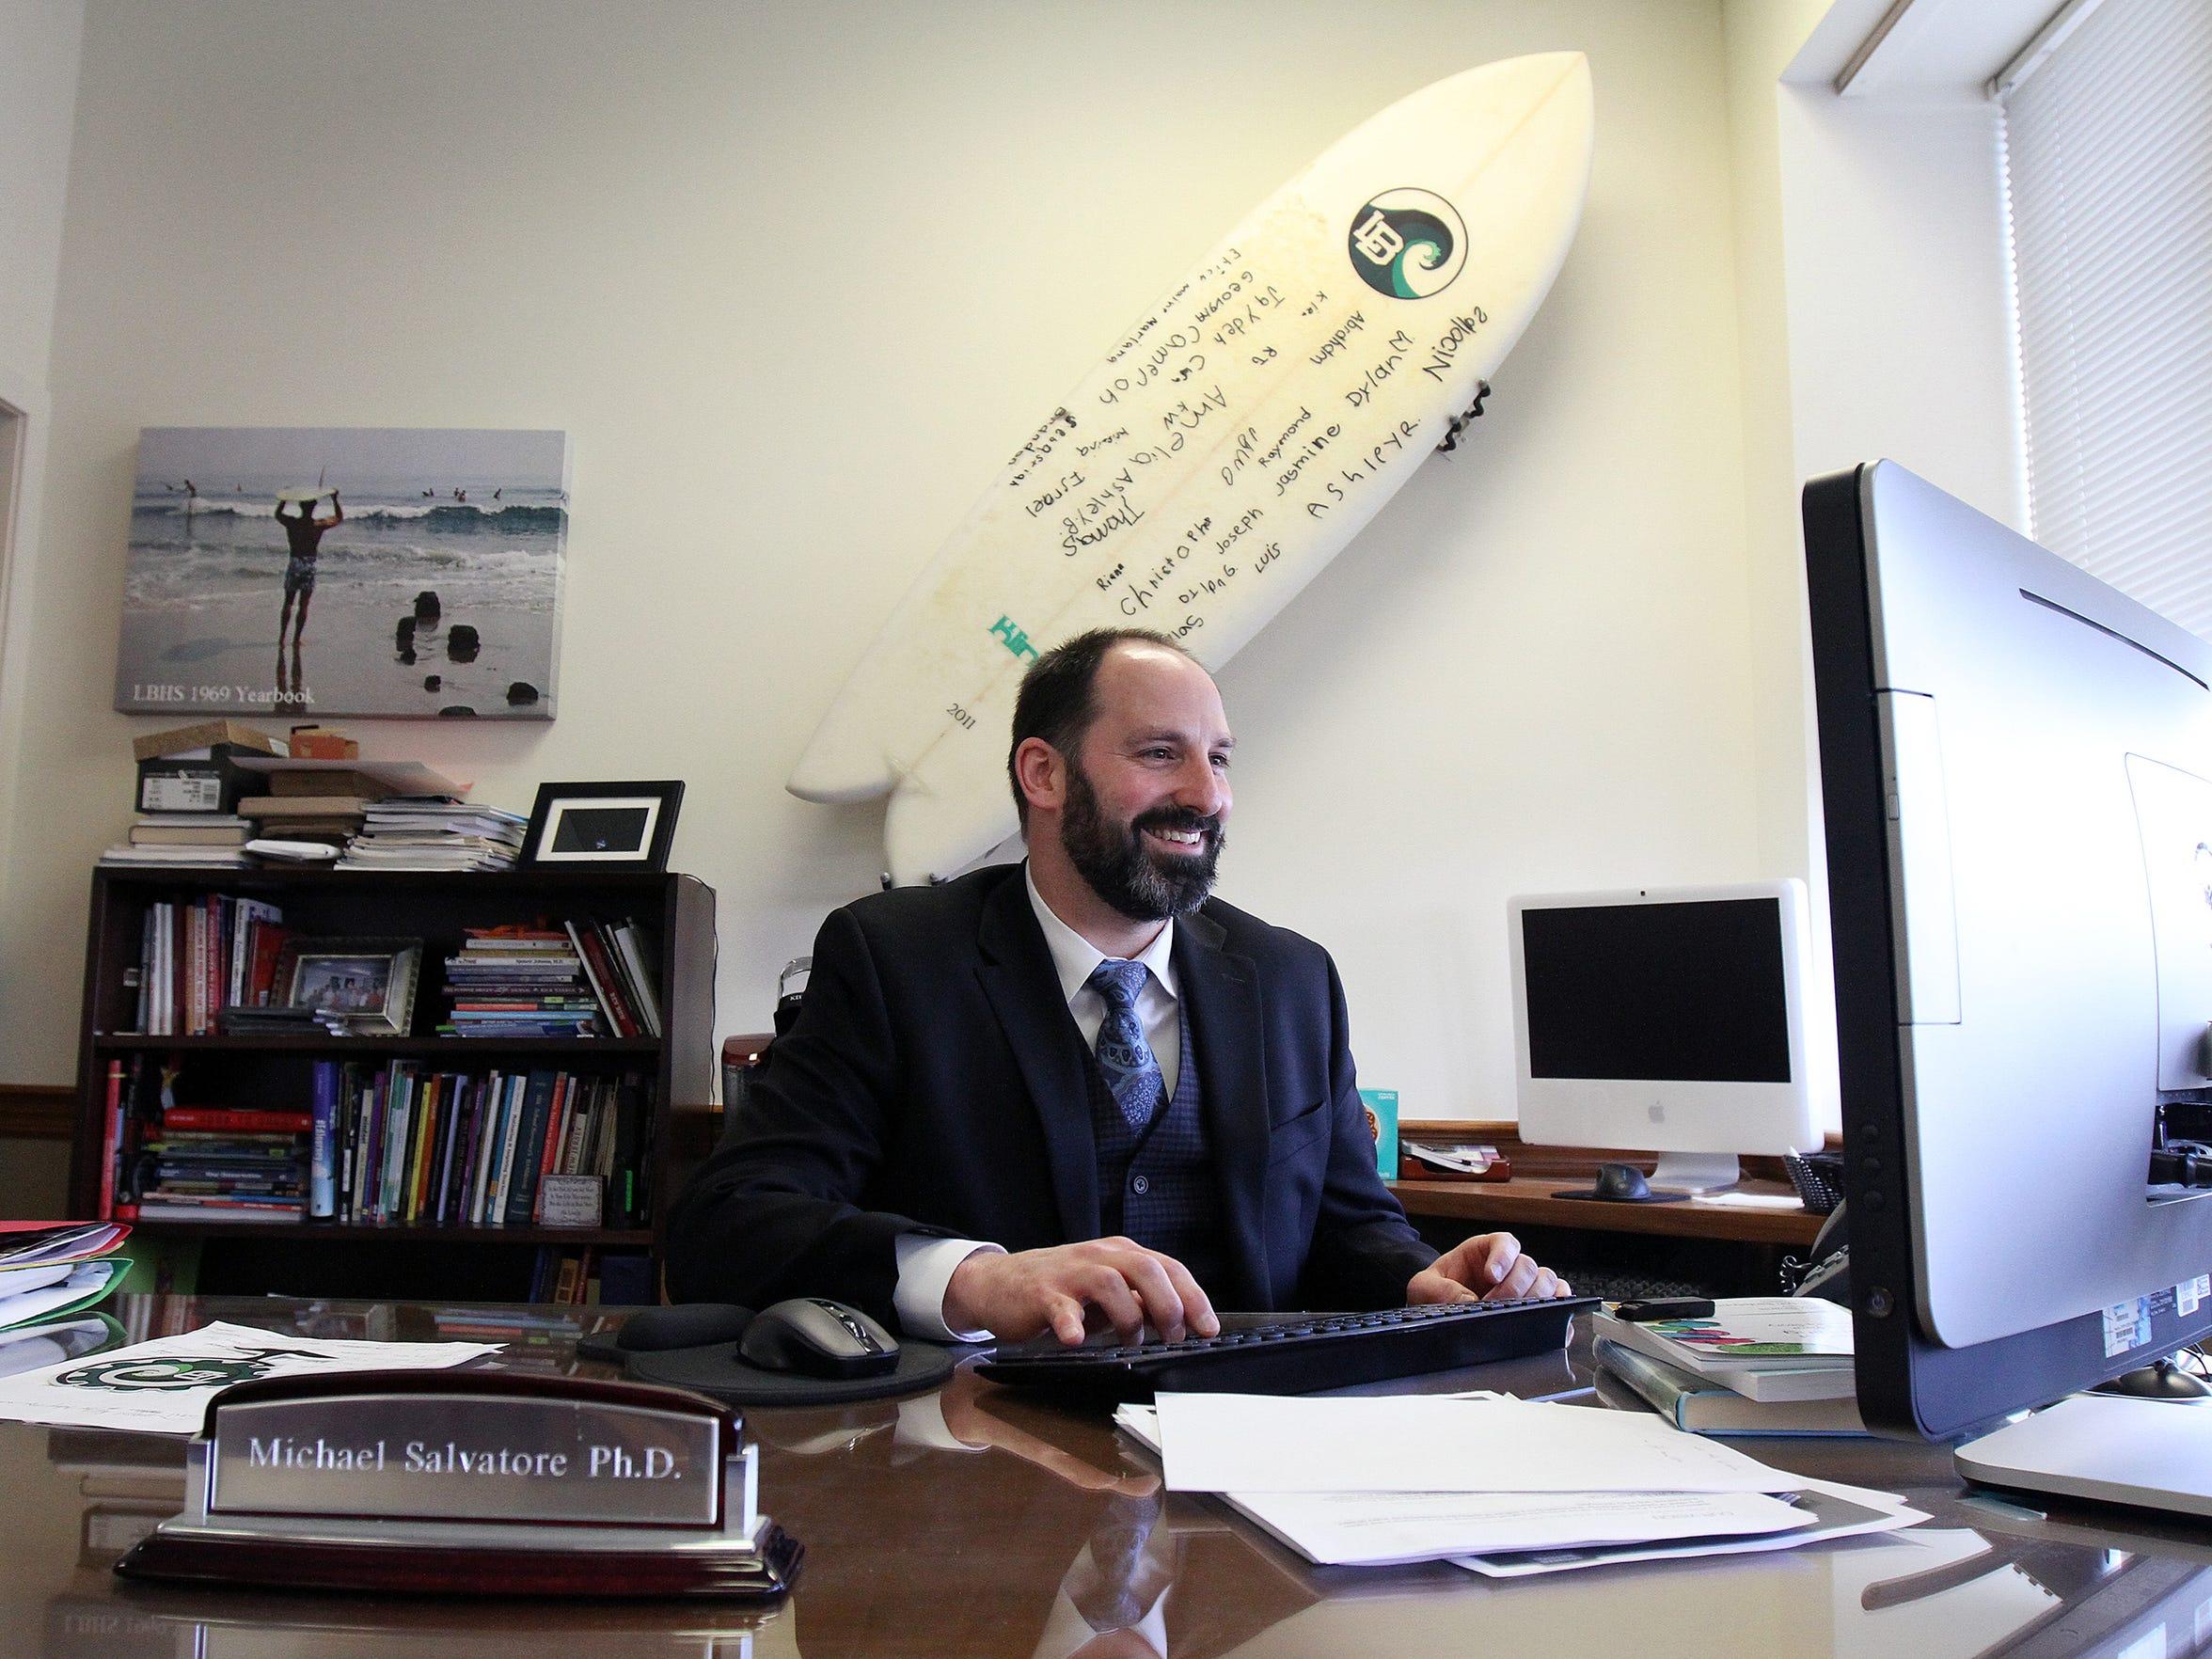 Long Branch superintendent Michael Salvatore speaks